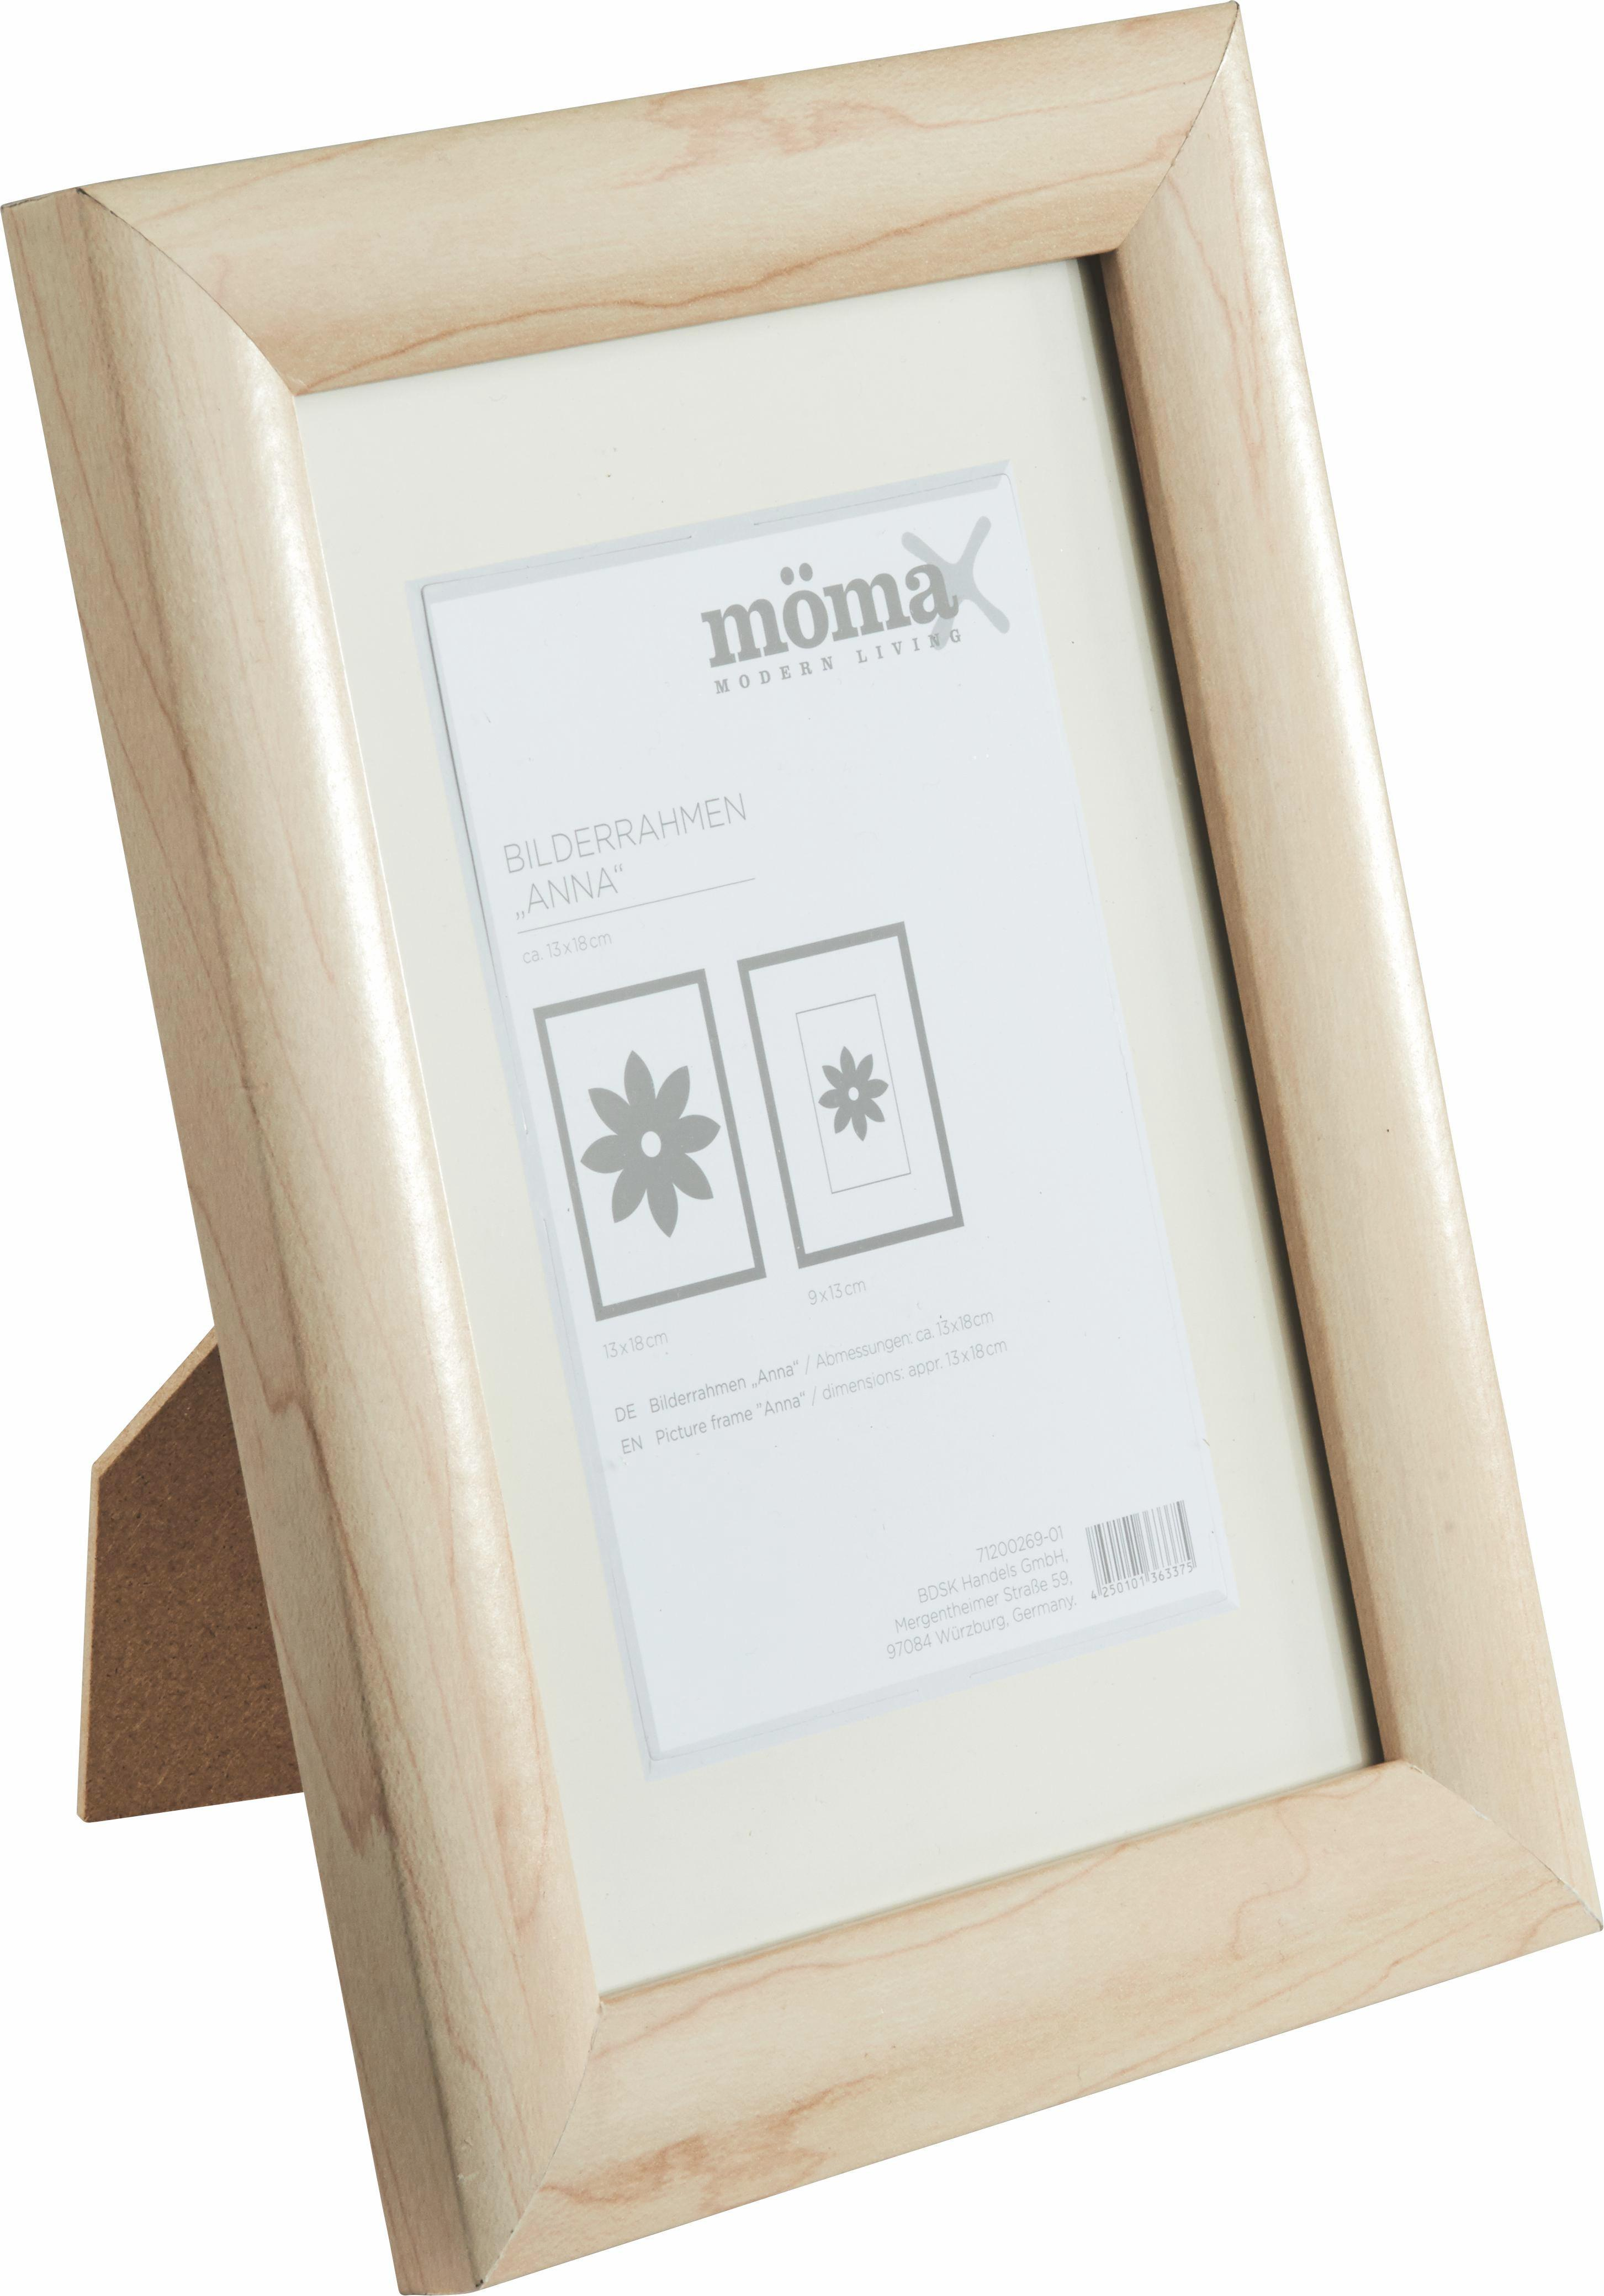 Bilderrahmen Anna, ca. 18x24cm aus Holz - Naturfarben, ROMANTIK / LANDHAUS, Glas/Holz (18/24cm) - MÖMAX modern living